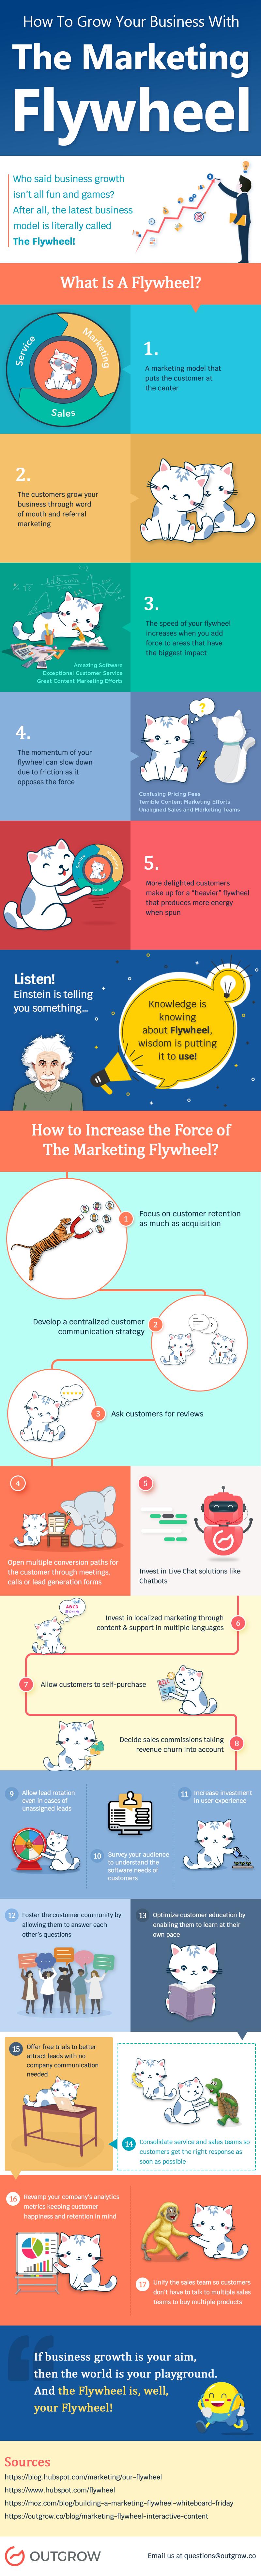 Infographic: Marketing Flywheel